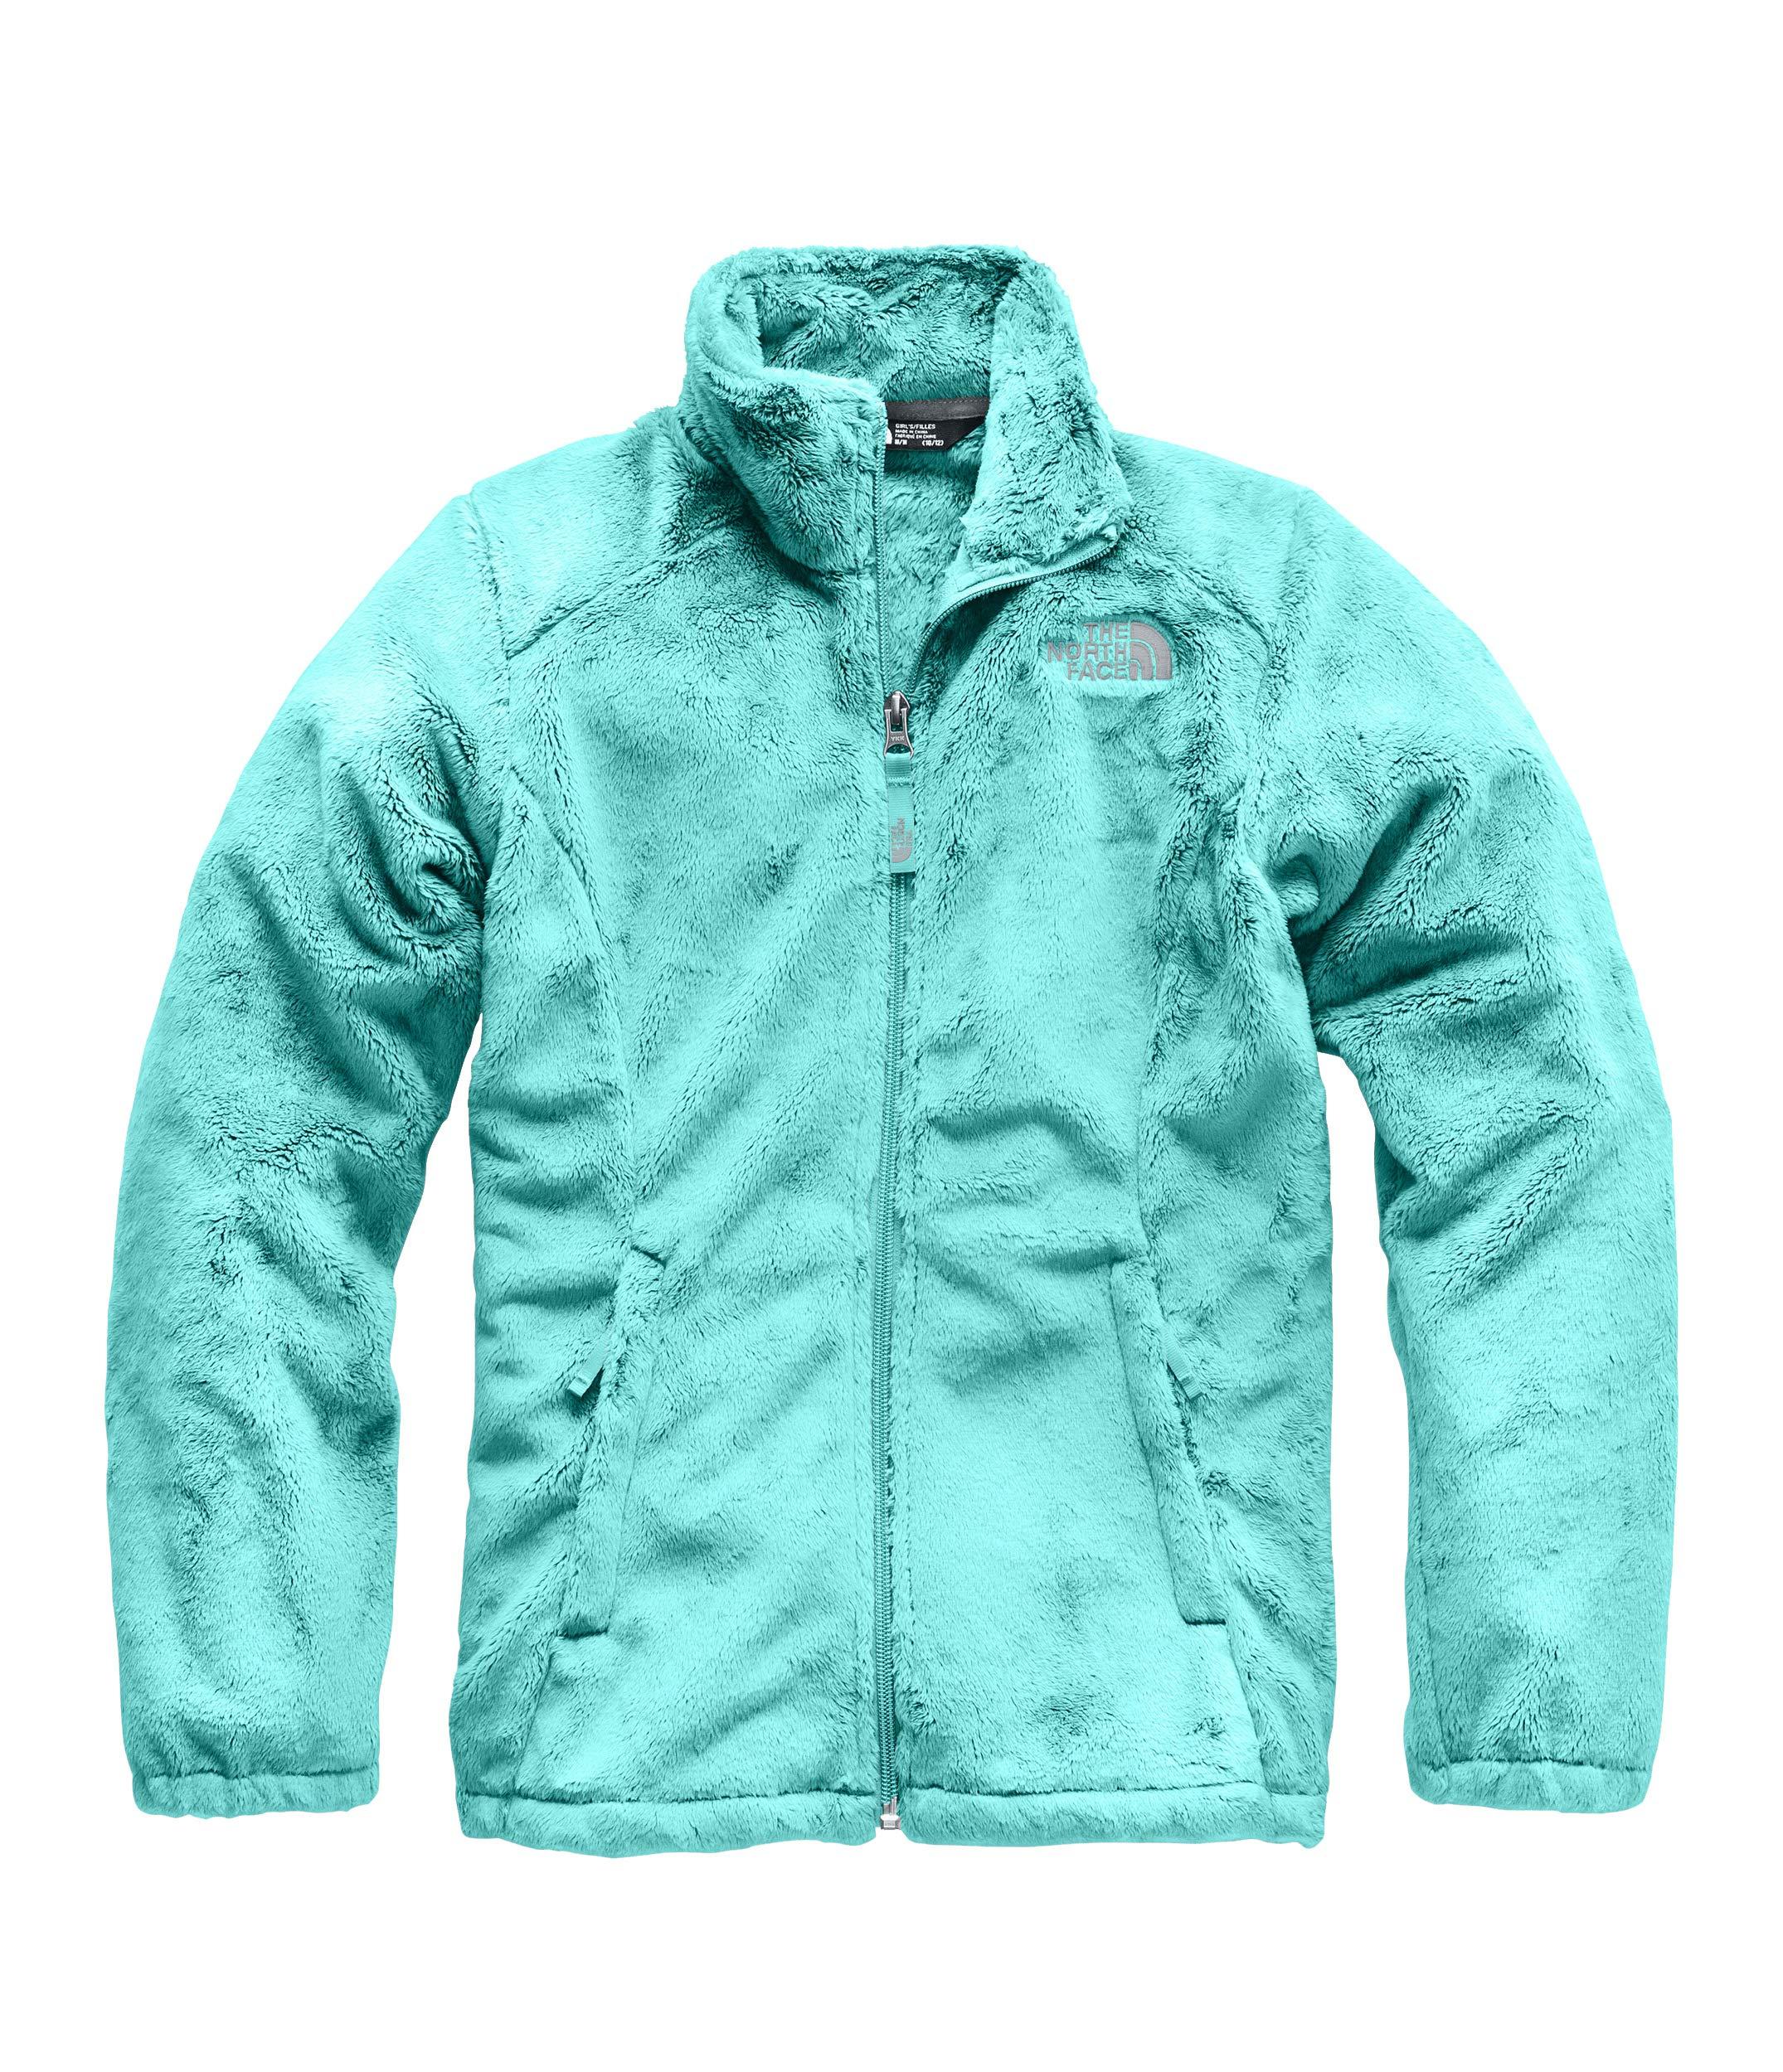 The North Face Girl's Osolita Jacket - Mint Blue - XXS